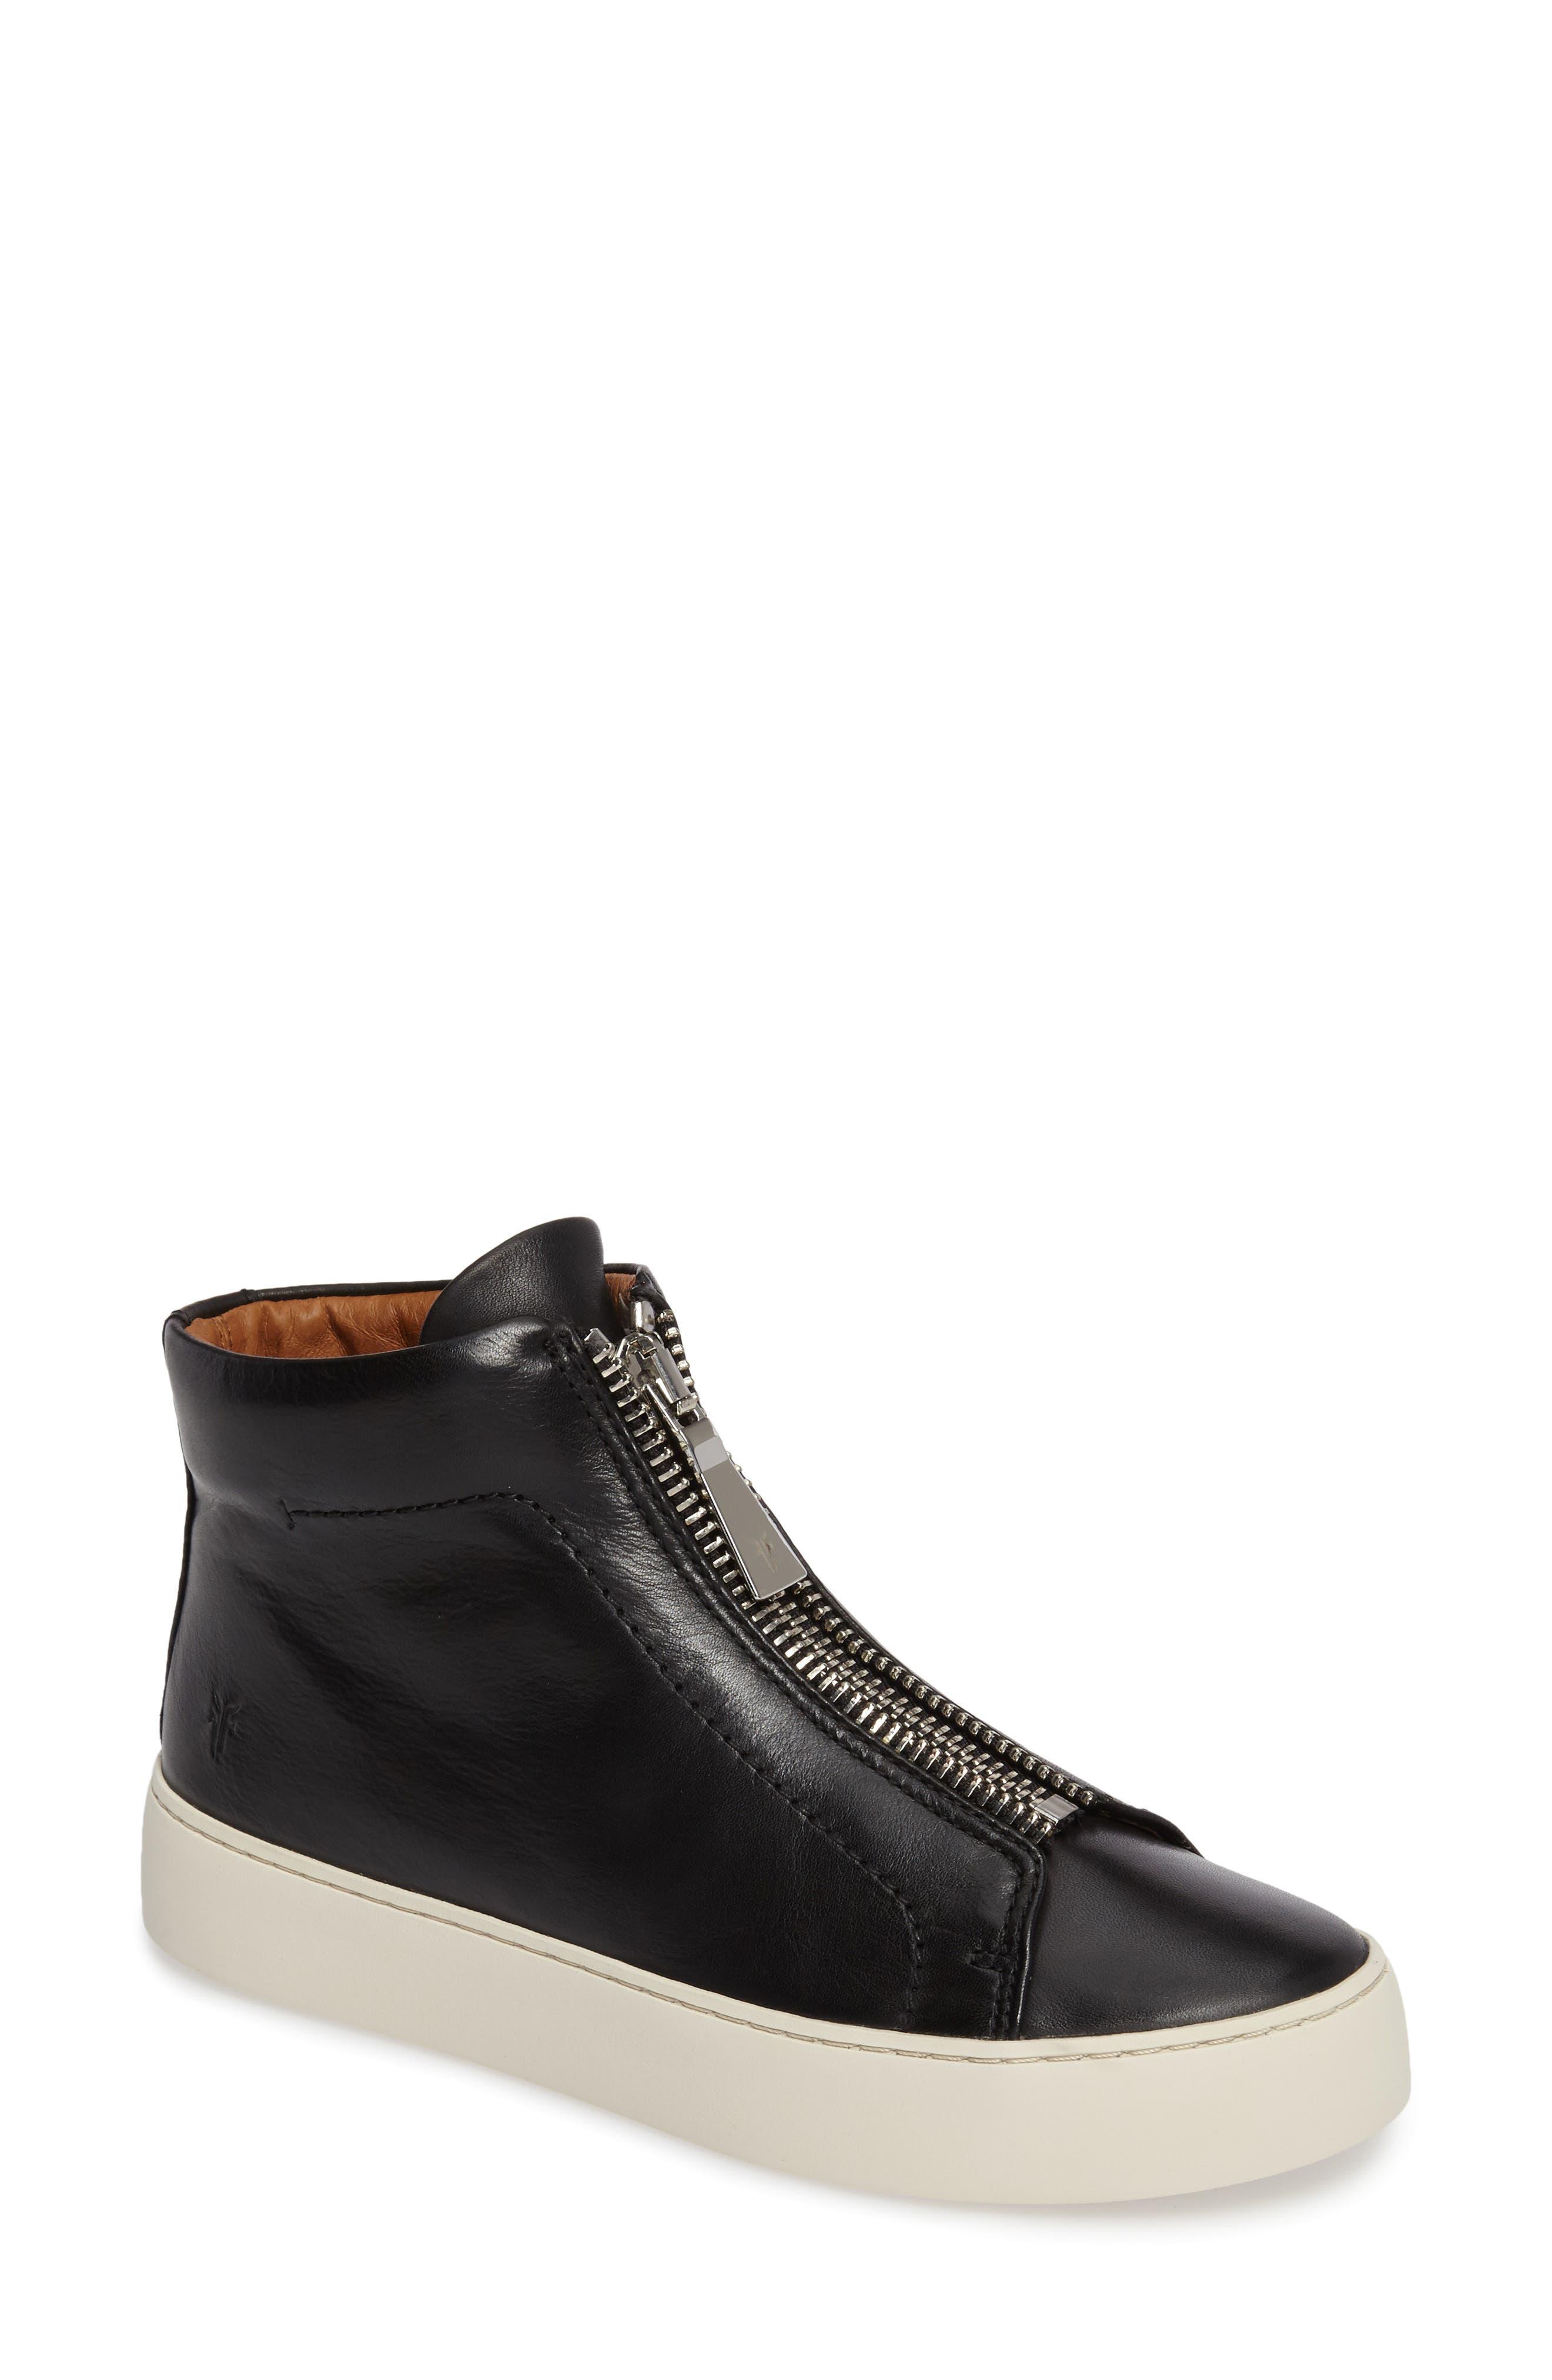 Lena Zip High Top Sneaker,                             Main thumbnail 1, color,                             BLACK LEATHER